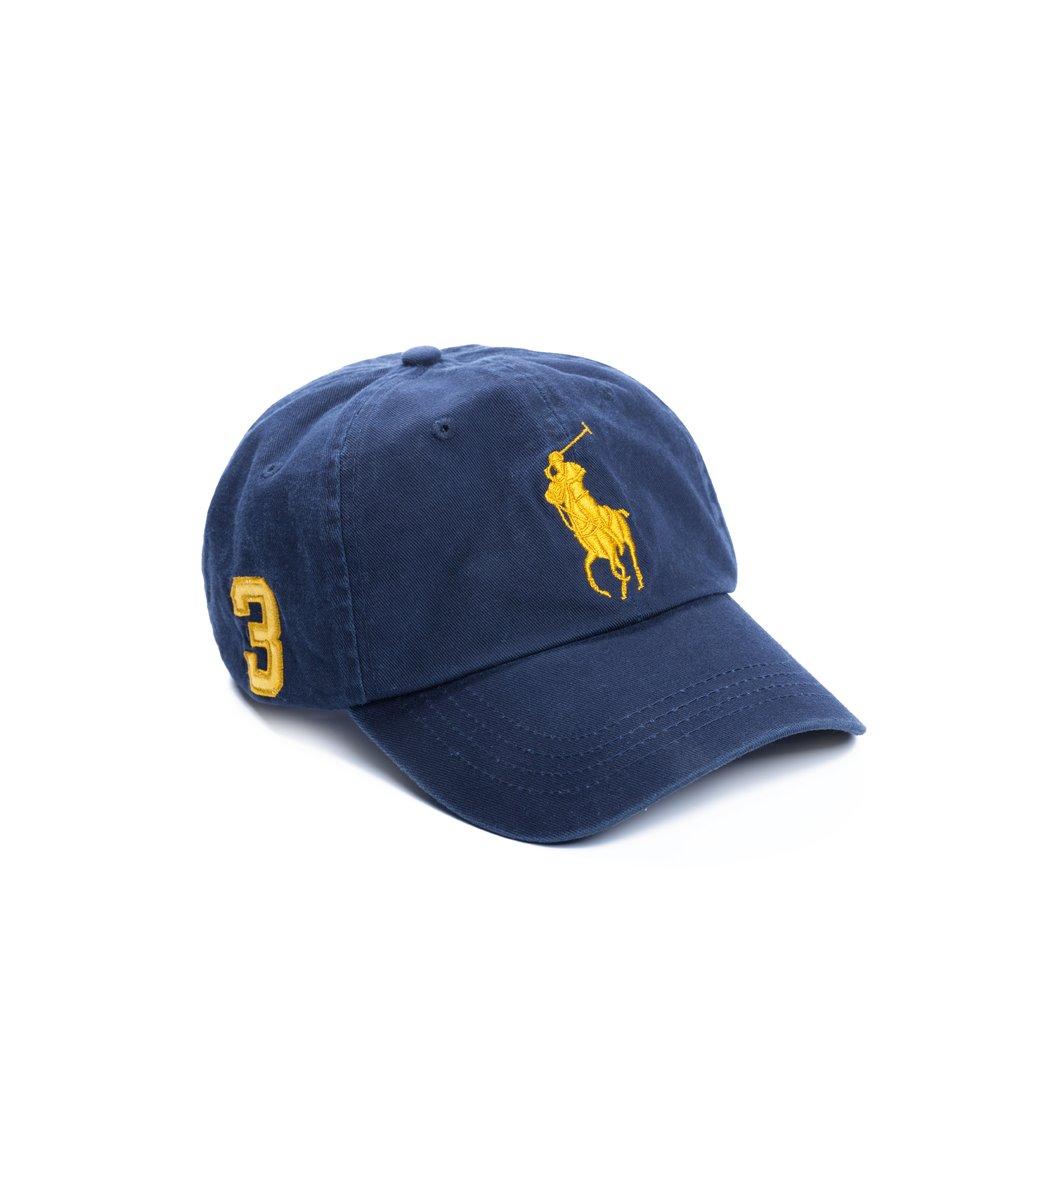 Кепка POLO Ralph Lauren Classic 3 Тёмно-синий/жёлтый